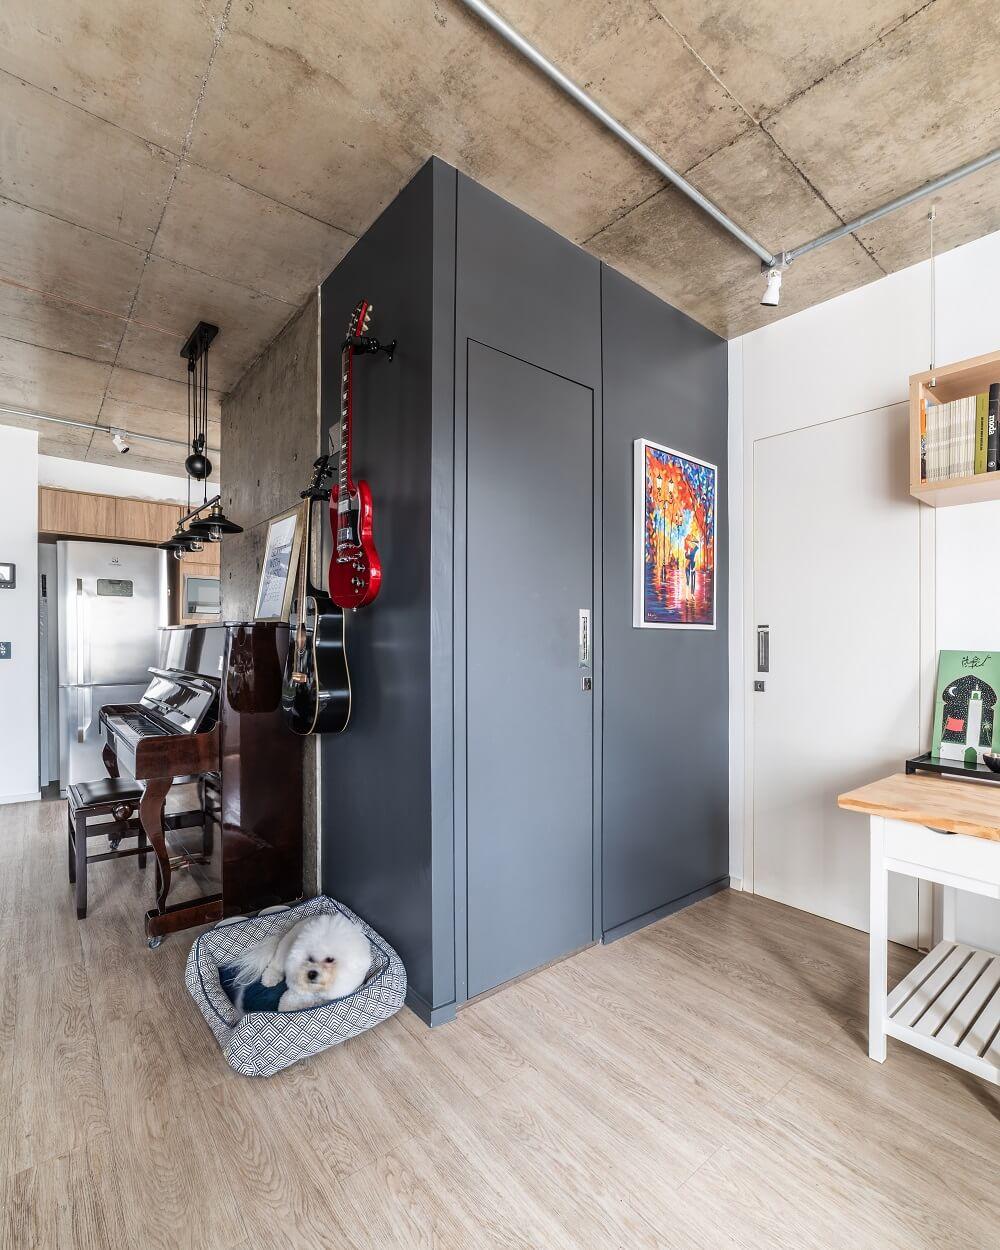 A parede preta camufla a porta que leva ao lavabo e se conecta com o estilo industrial. Foto: Guilherme Pucci